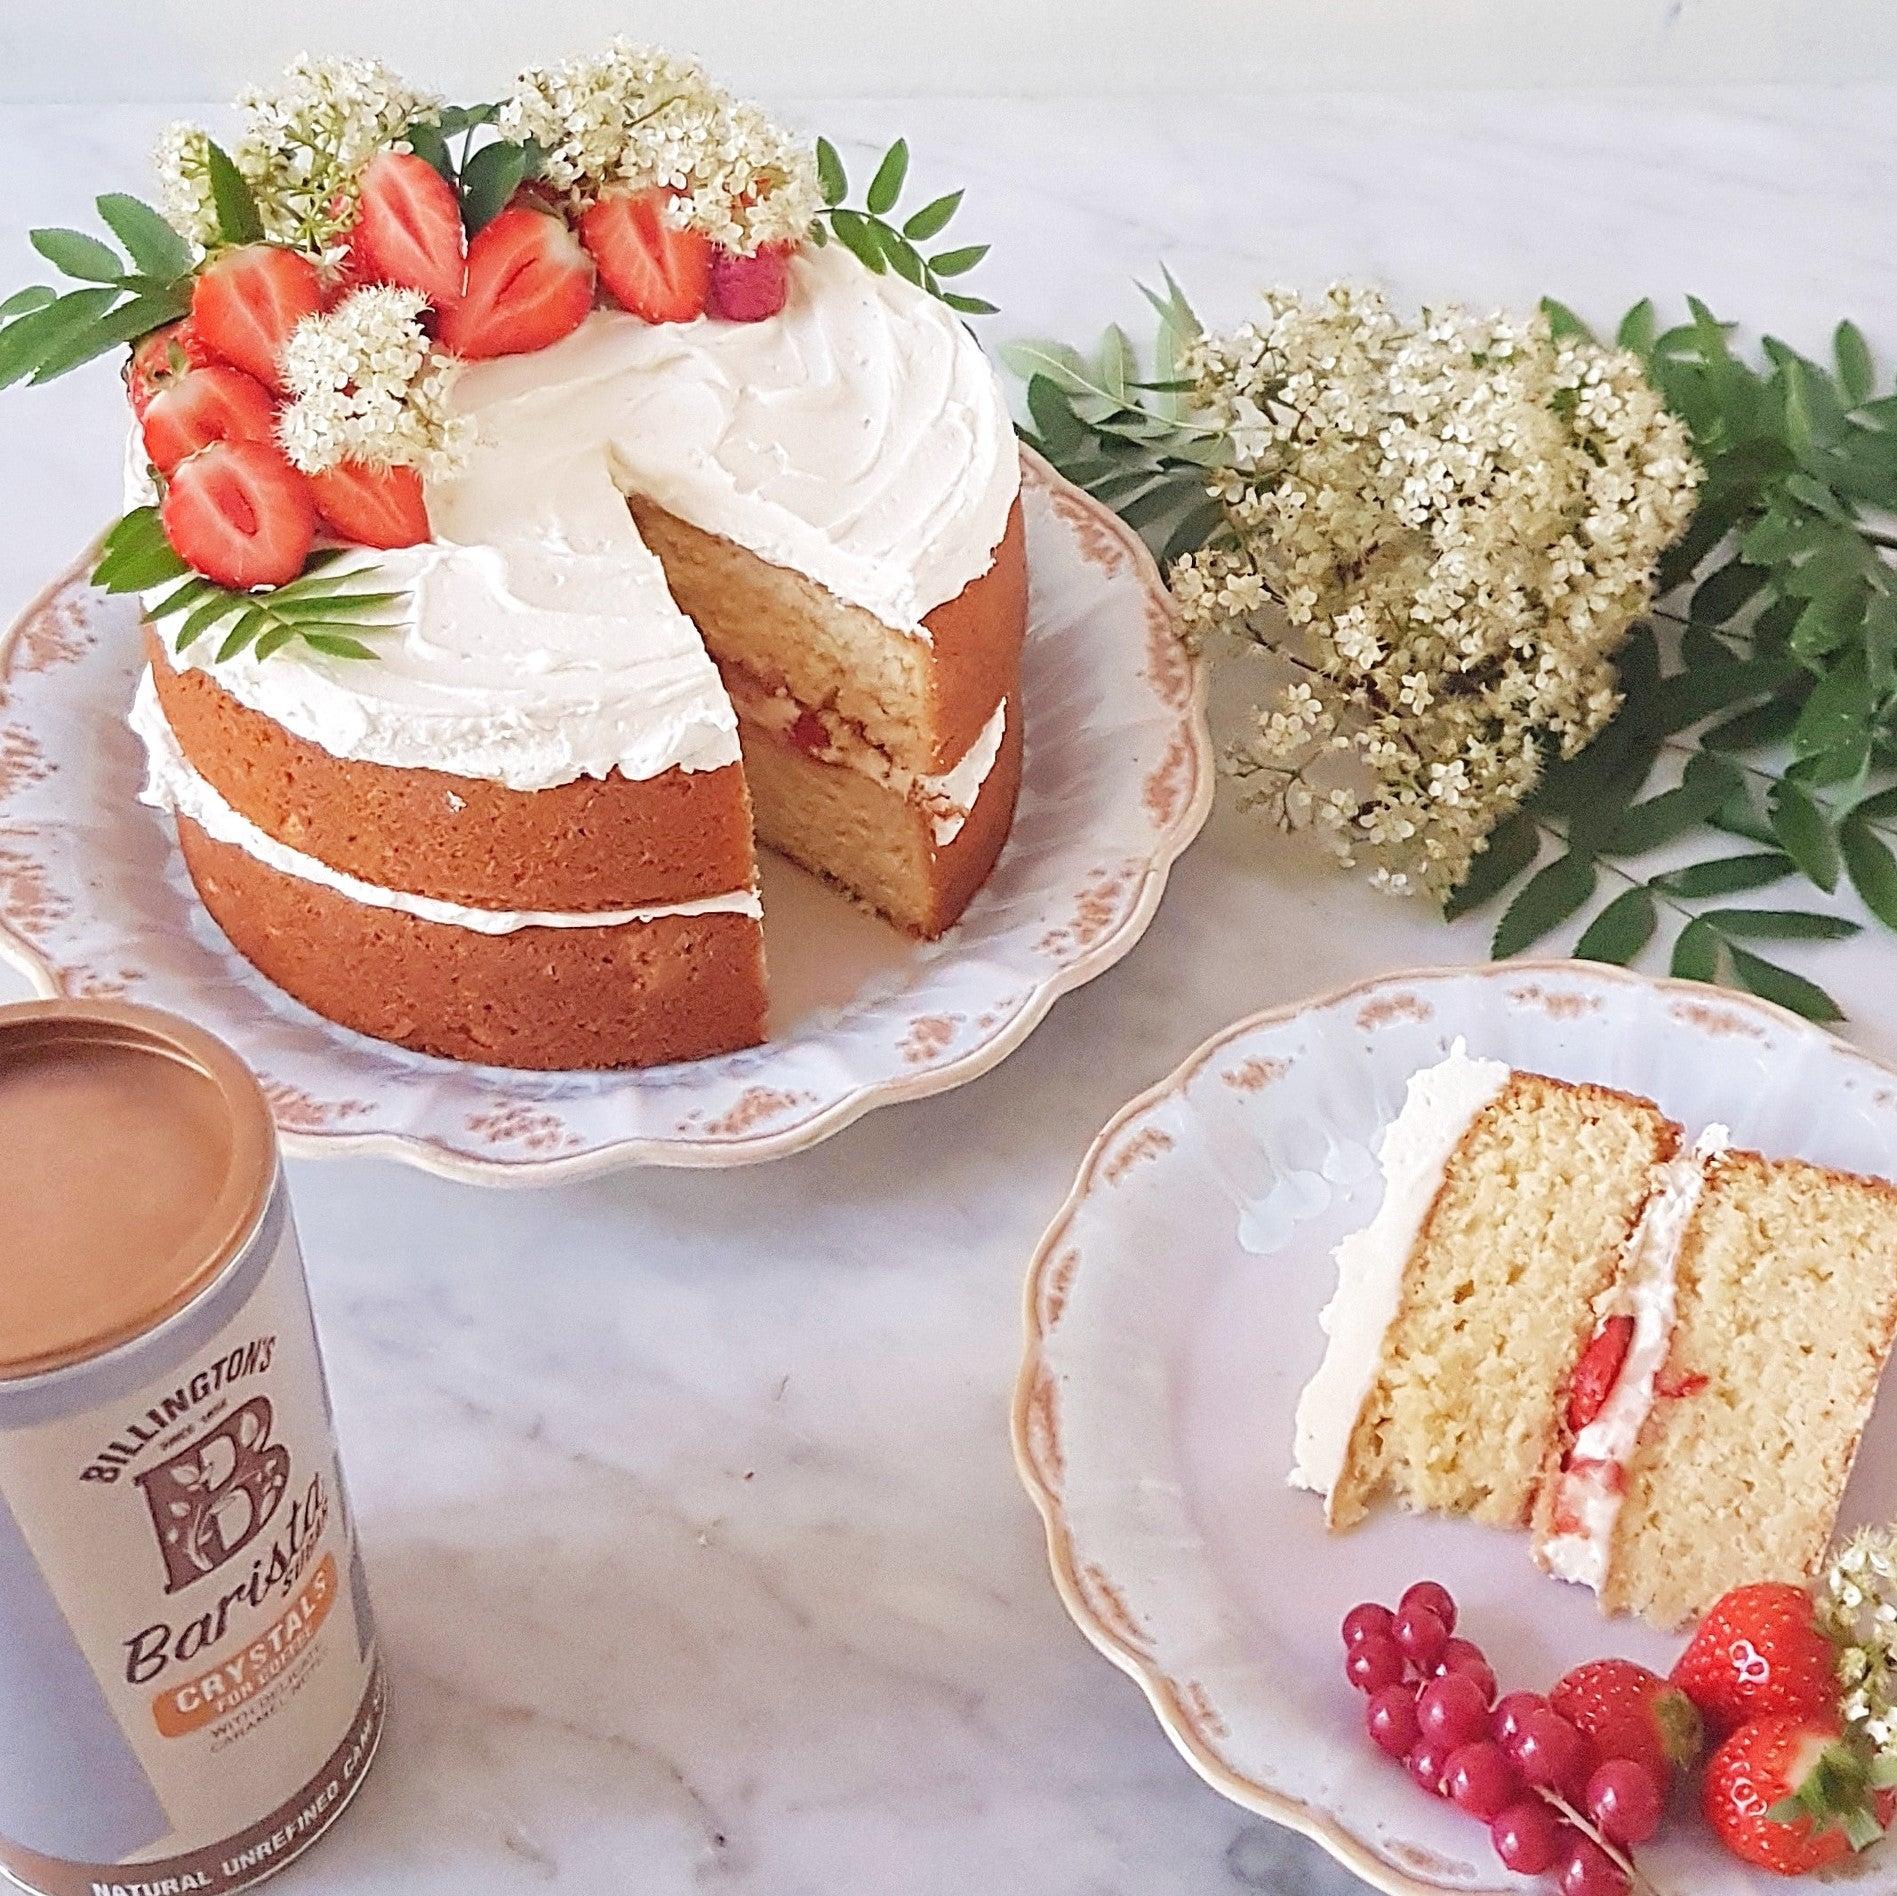 Ultimate-Summer-Berry-Cake-Lily-Vanilli-(6).jpeg